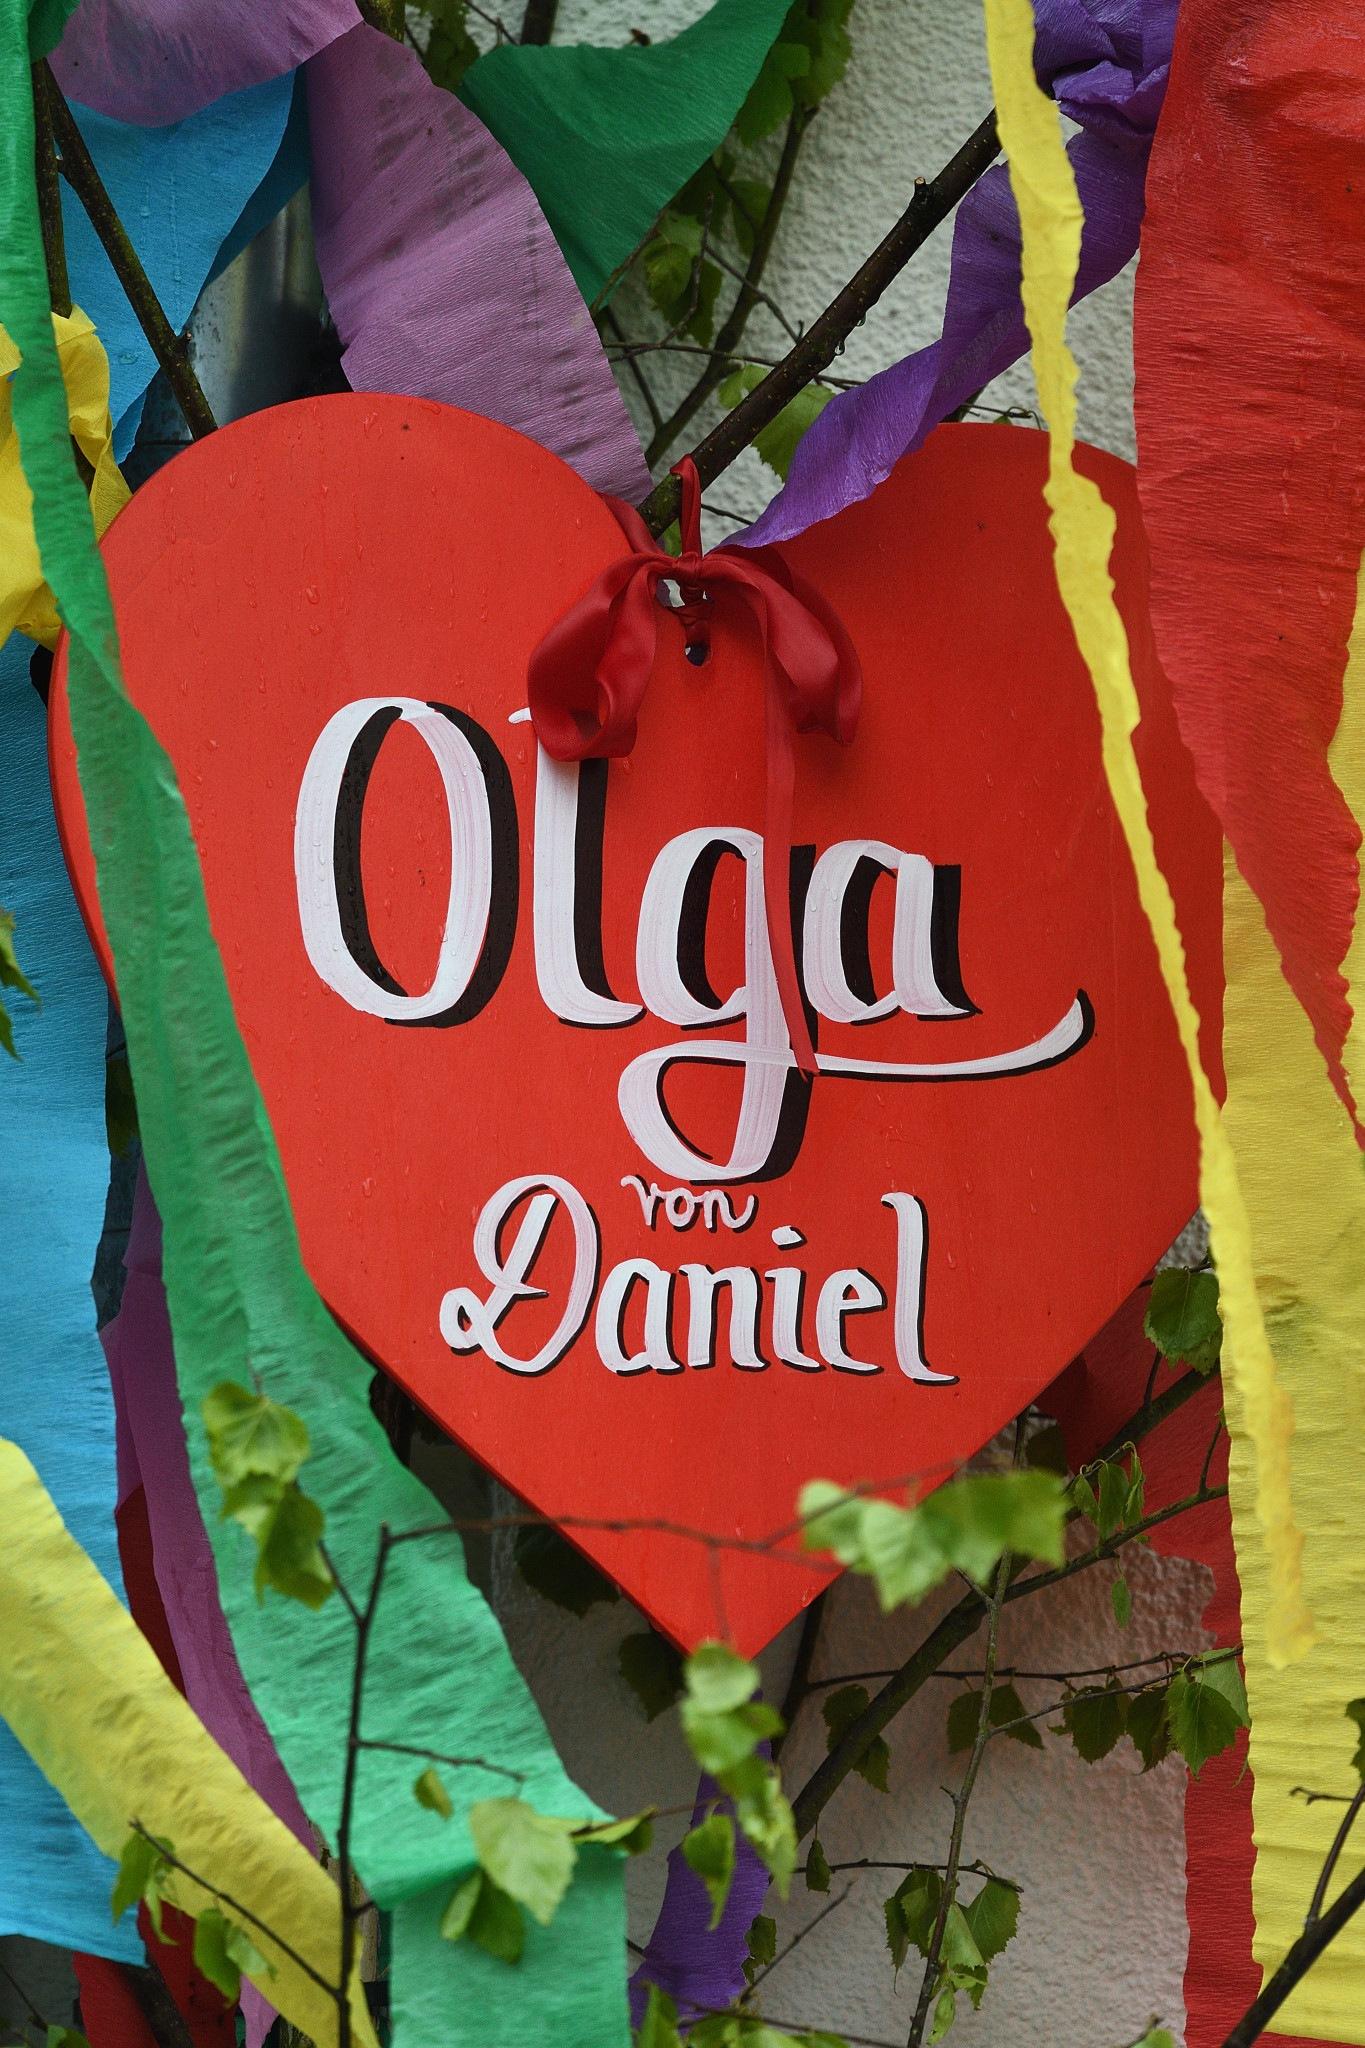 Olga von Daniel by Frank Fremerey